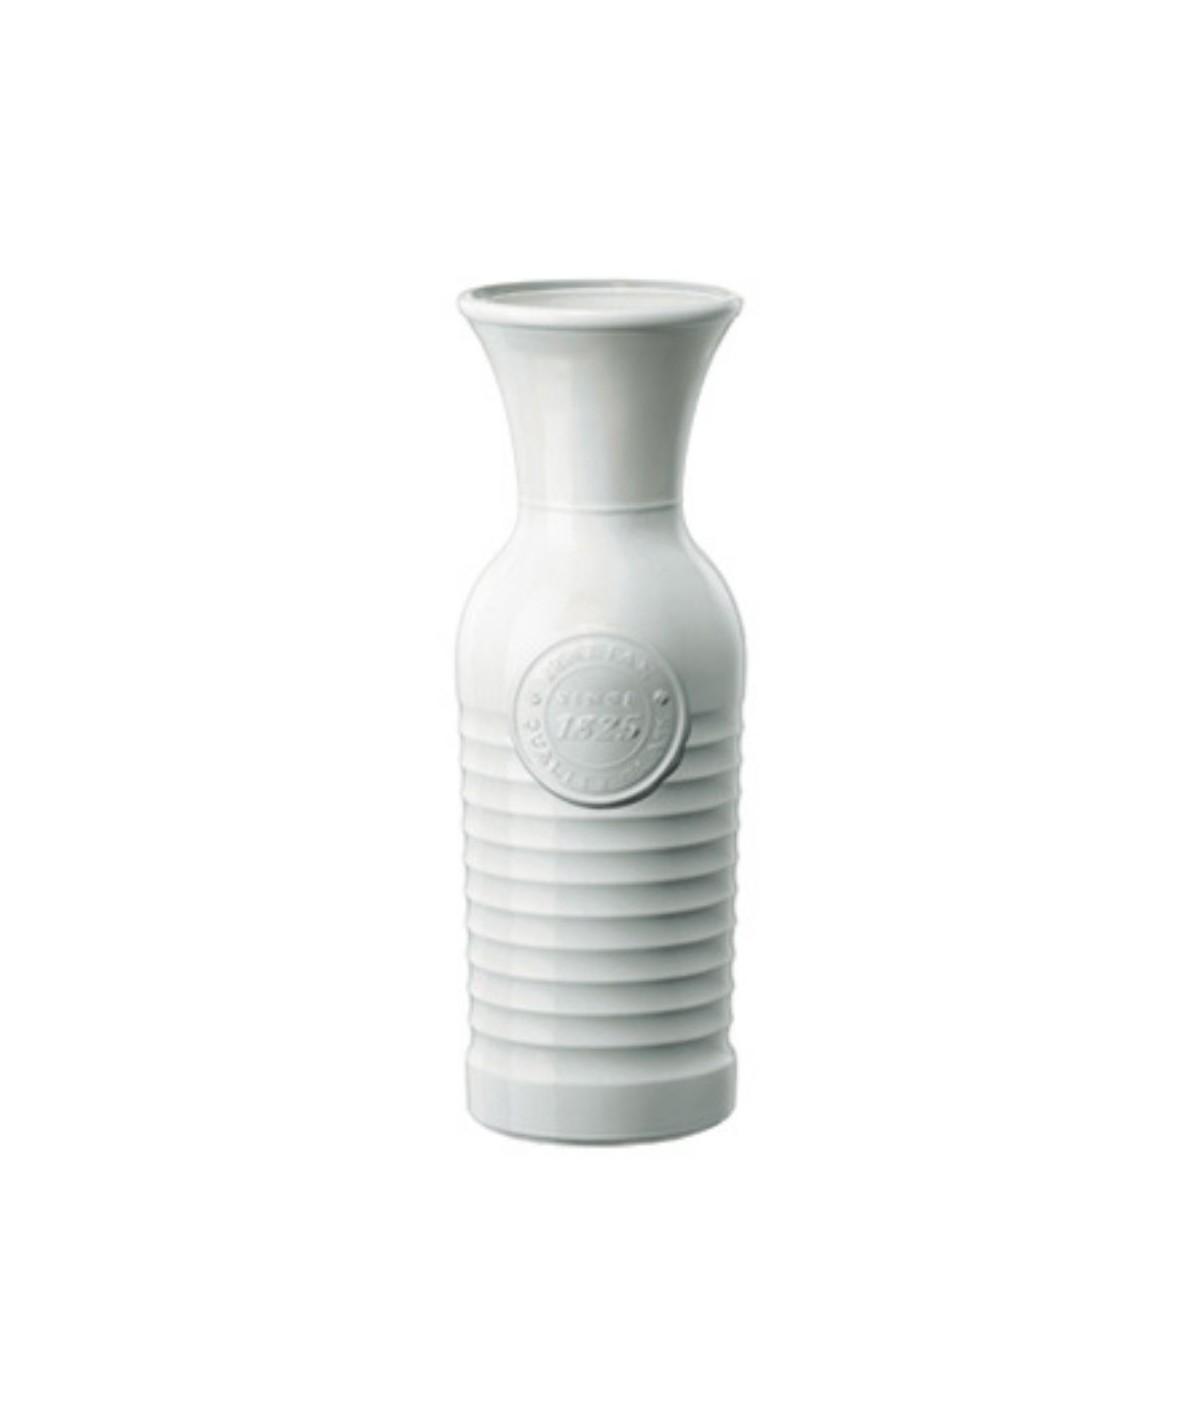 Caraffa in ceramica bianca officina - Bormioli